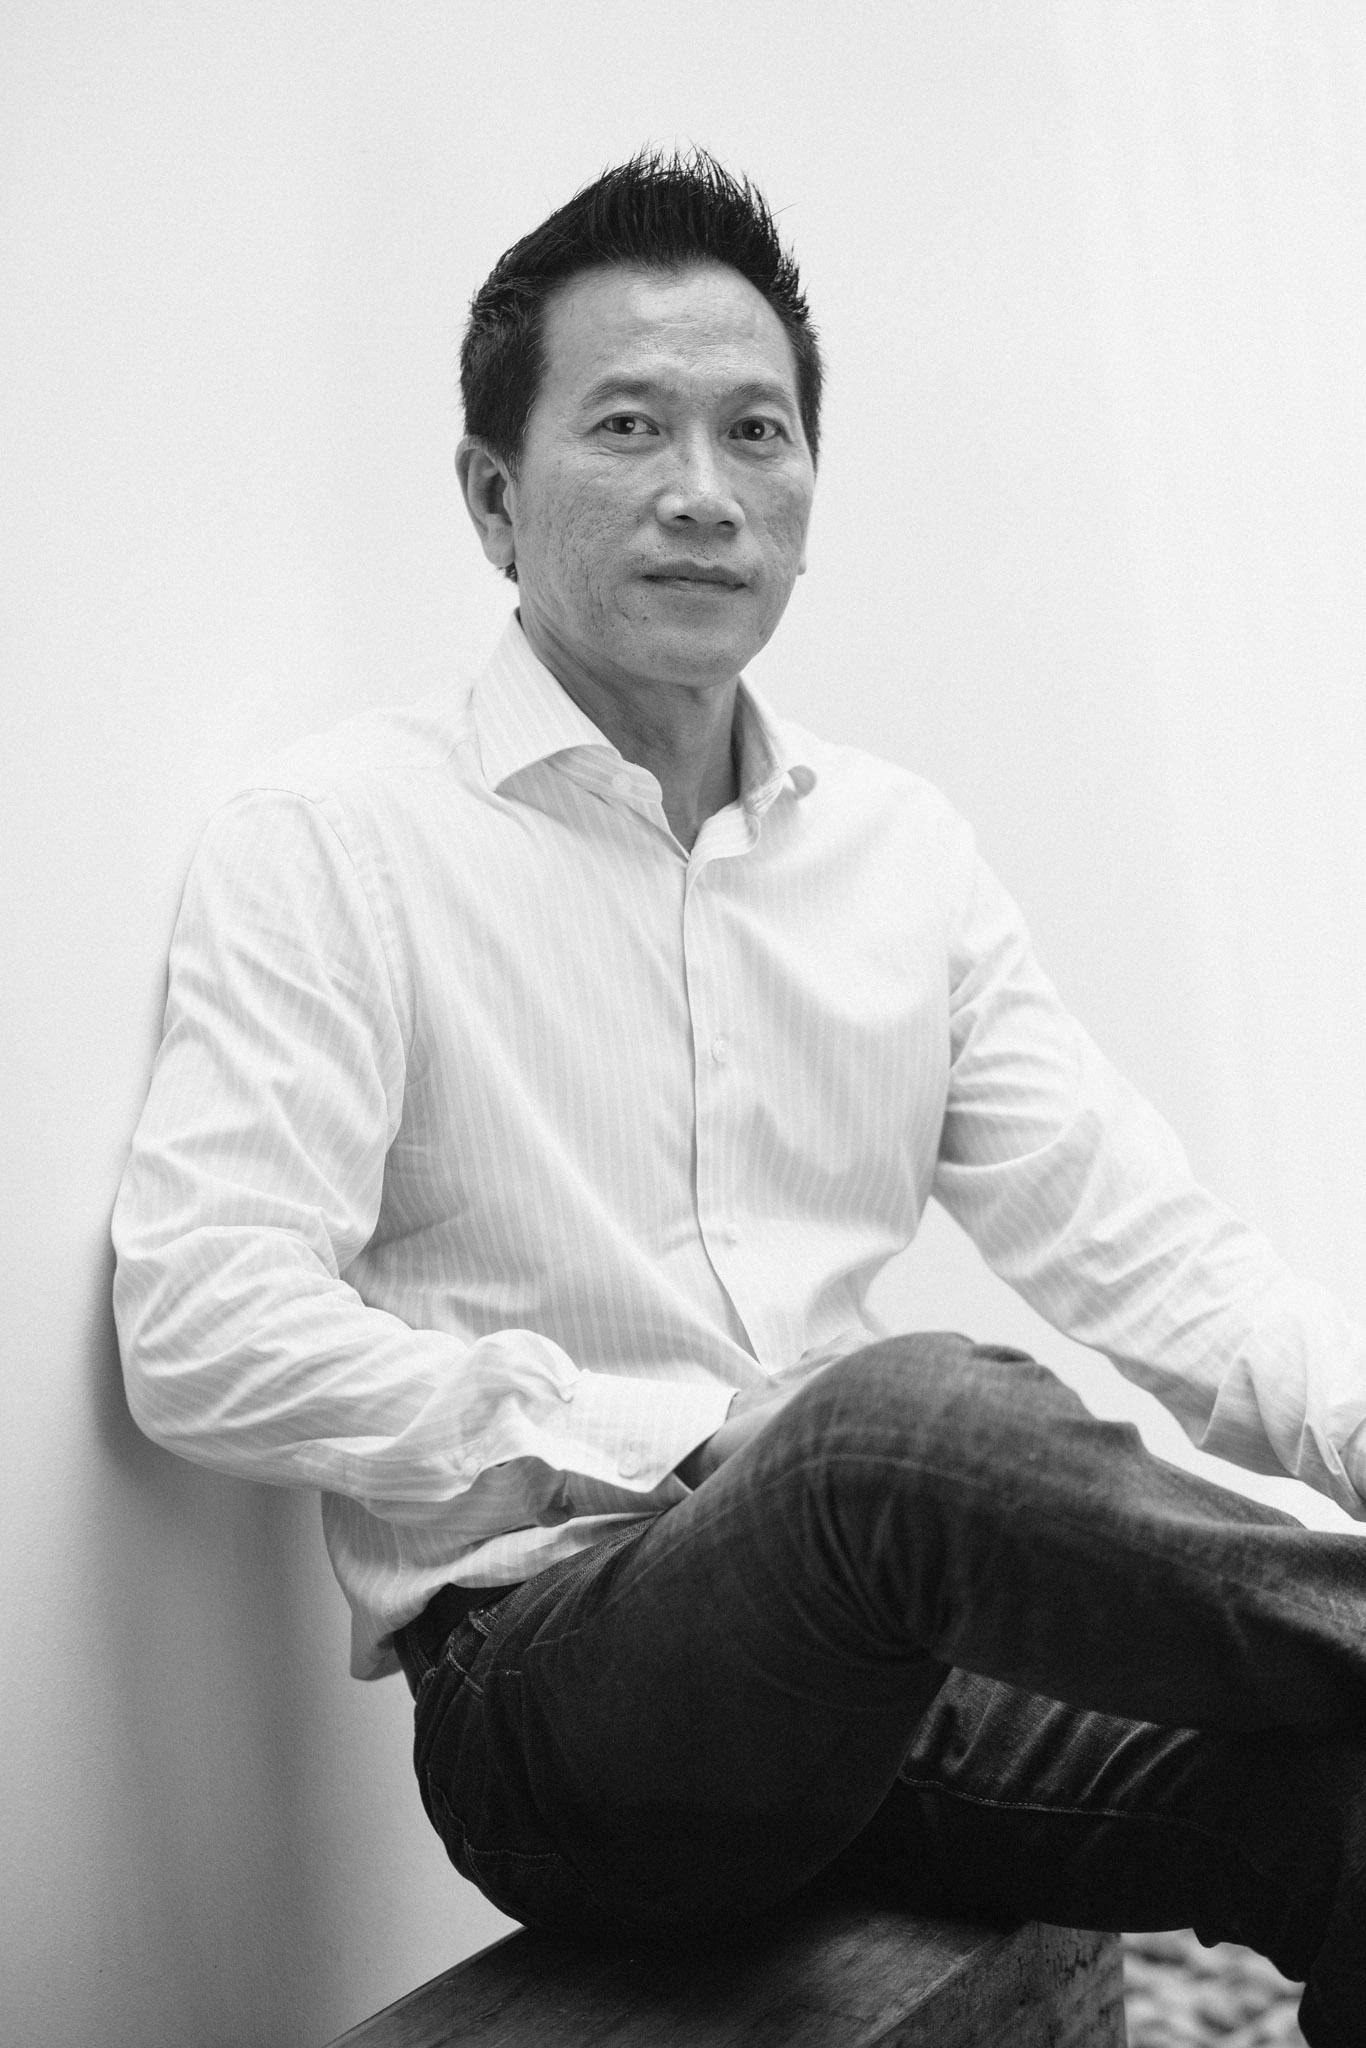 singapore-commercial-editorial-photographer-architecture-president-design-award-singapore-architect-magazine-zakaria-zainal-20.jpg